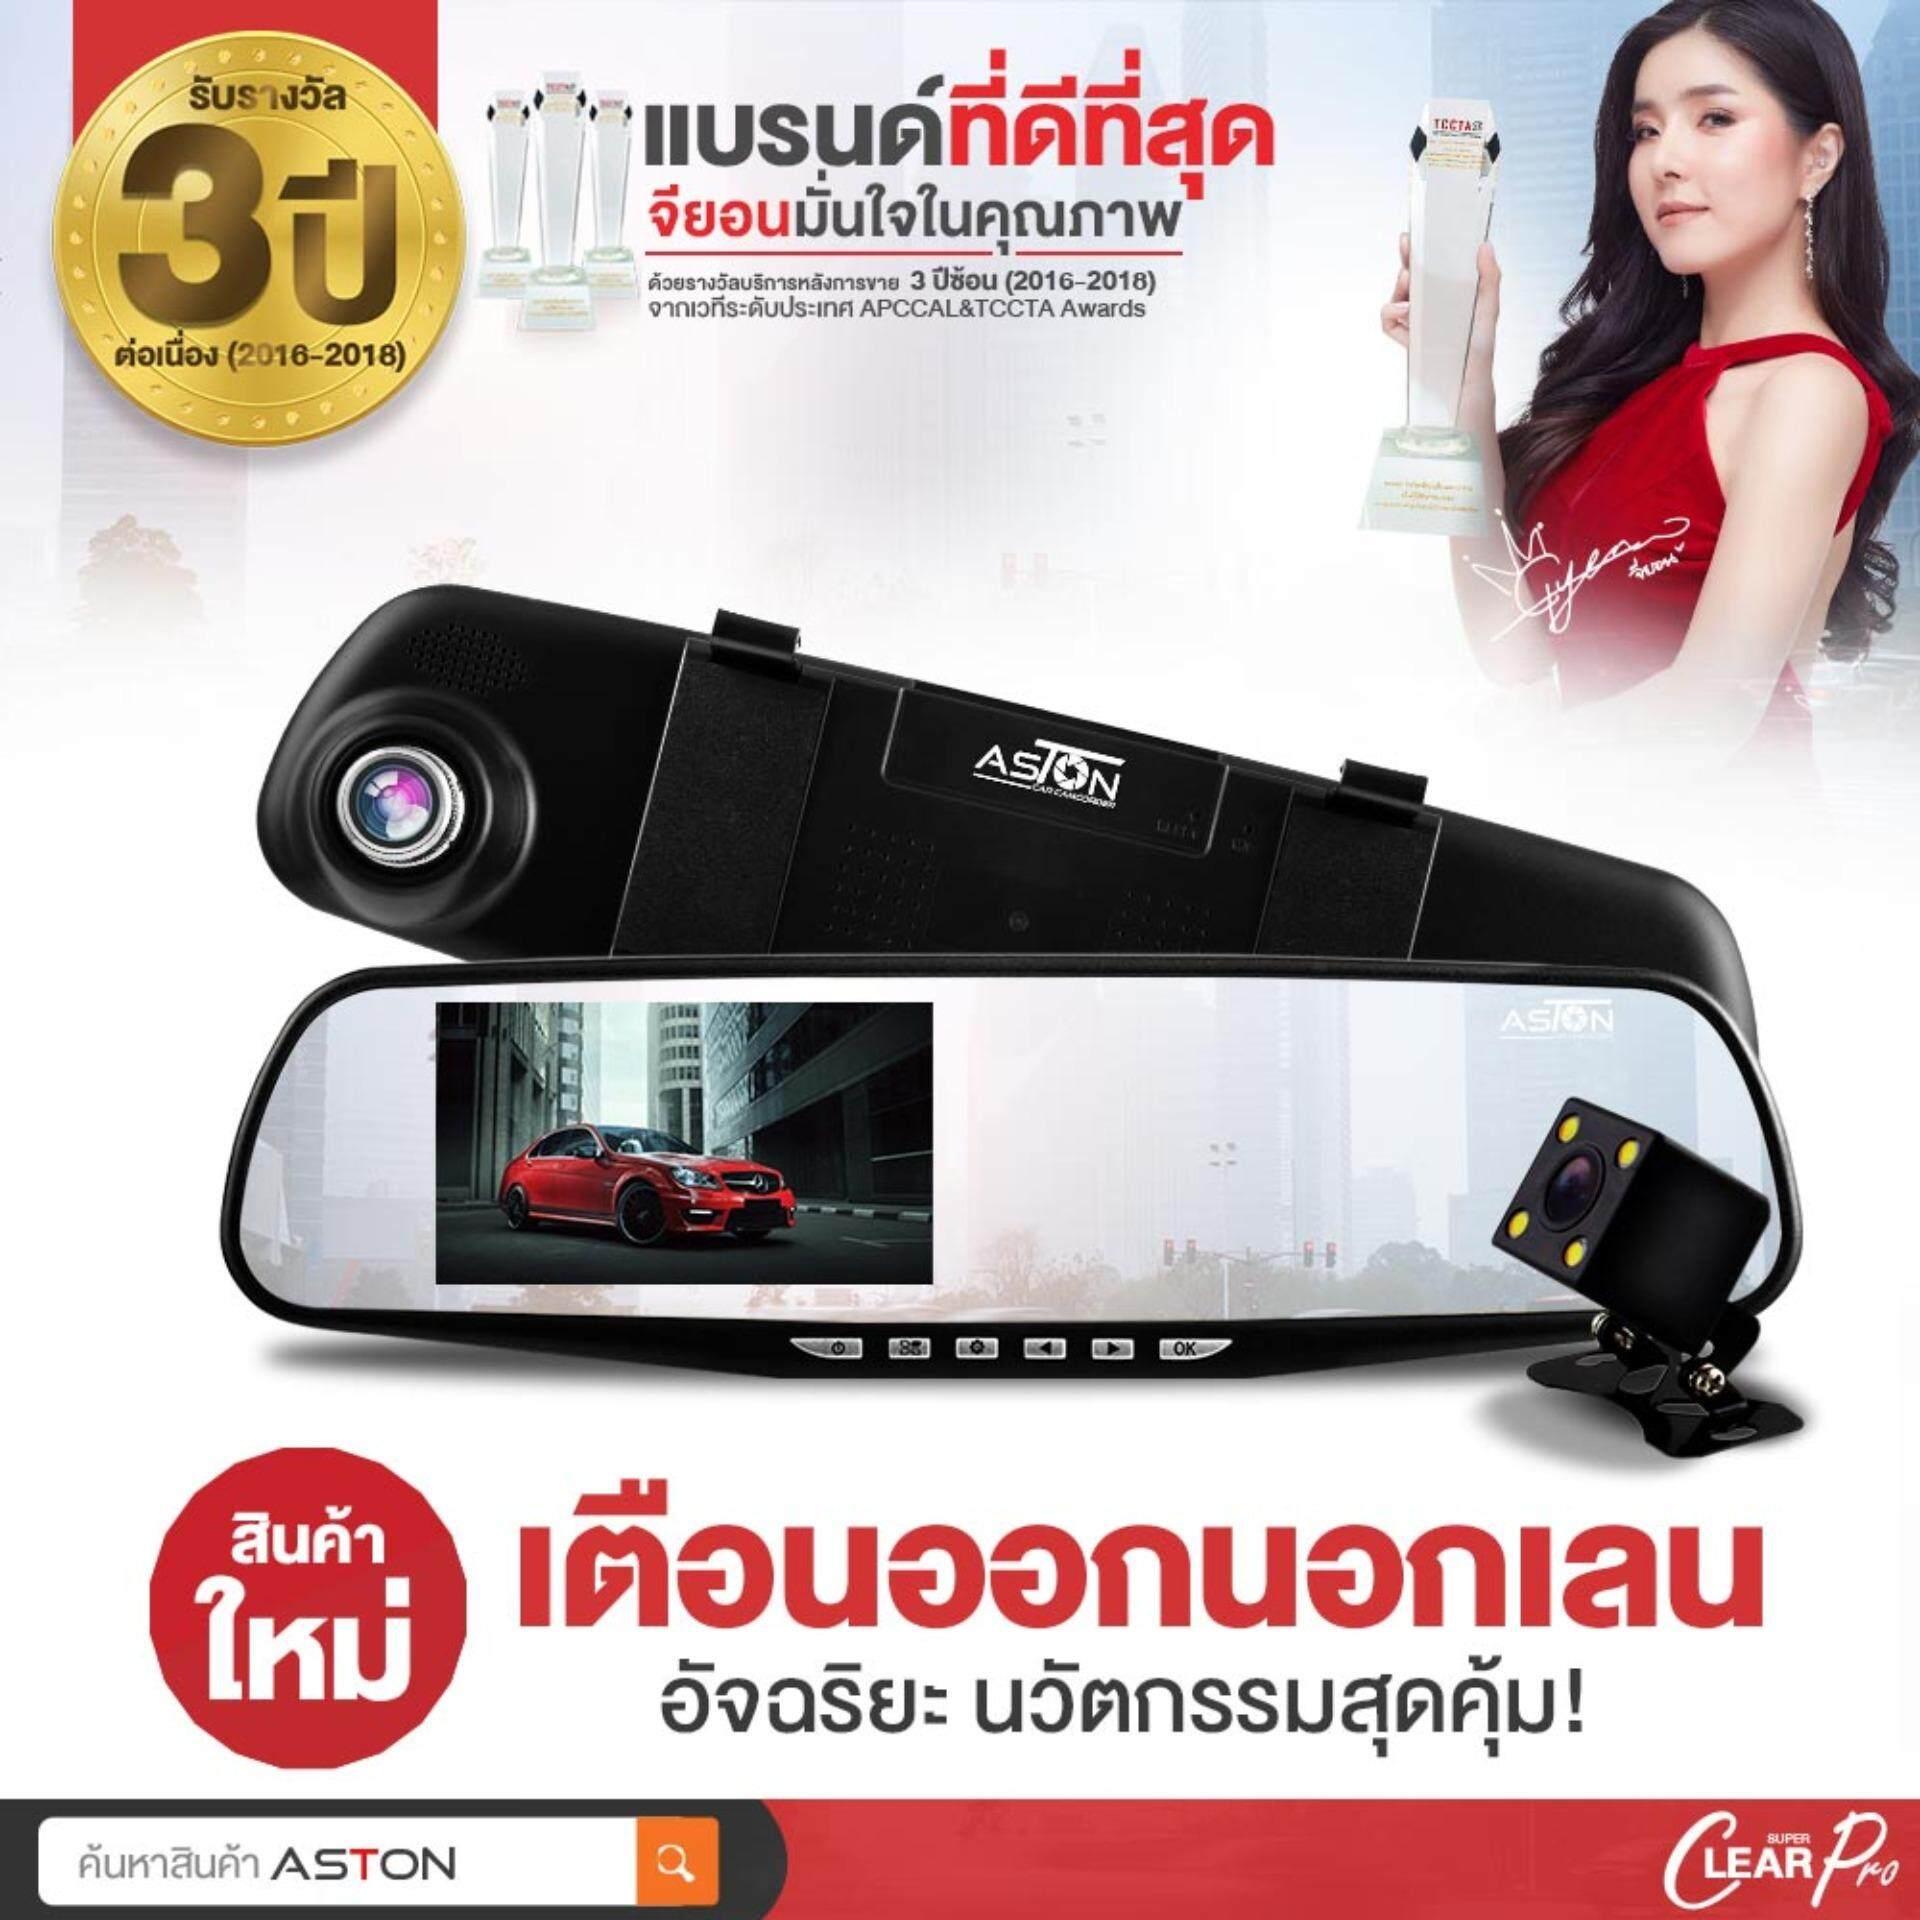 Aston Super Clear Pro โลกต้องสะเทือนกับความคุ้มค่า 10 In 1 แจ้าแรกและเจ้าเดียวที่กล้าให้มากขนาดนี้ แจ้งเตือนออกนอกเลน Wdr ปรับแสงอัตโนมัติ พร้อม 10 สุดยอดฟังก์ชั่นในกล้องเดียว By Aston International.